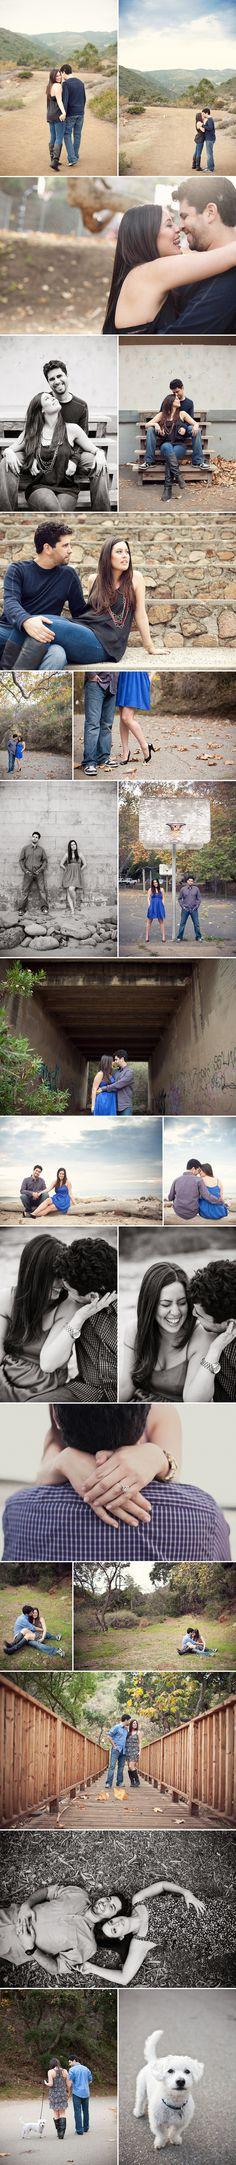 Jessica + Eric: Malibu Camp Engagement Photographer    Marianne Wilson Photography